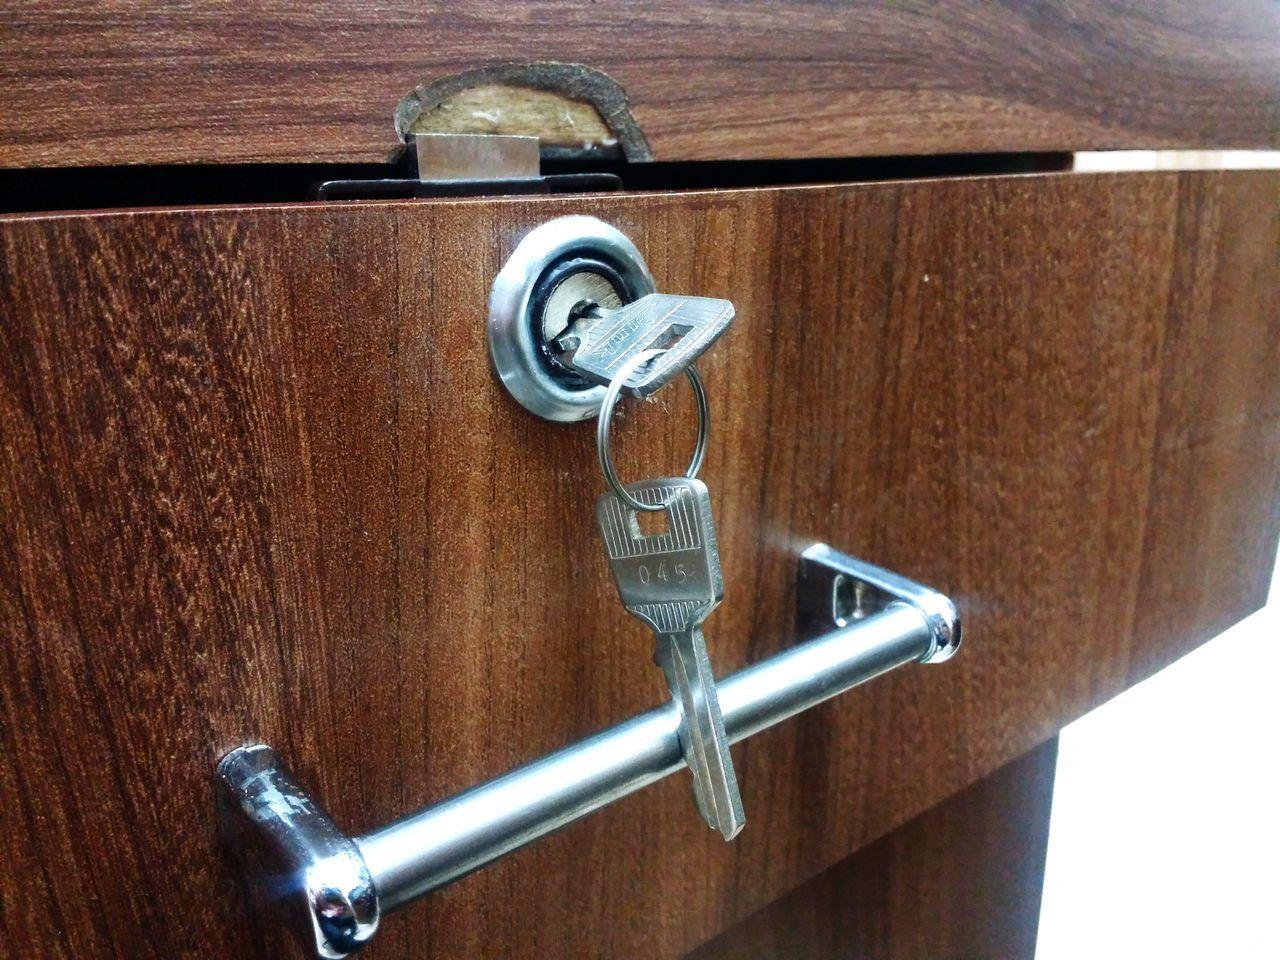 Door Wood - Material Metal Close-up No People Lock Day No Keyring Metallic Items Cupboard Keys Indoors